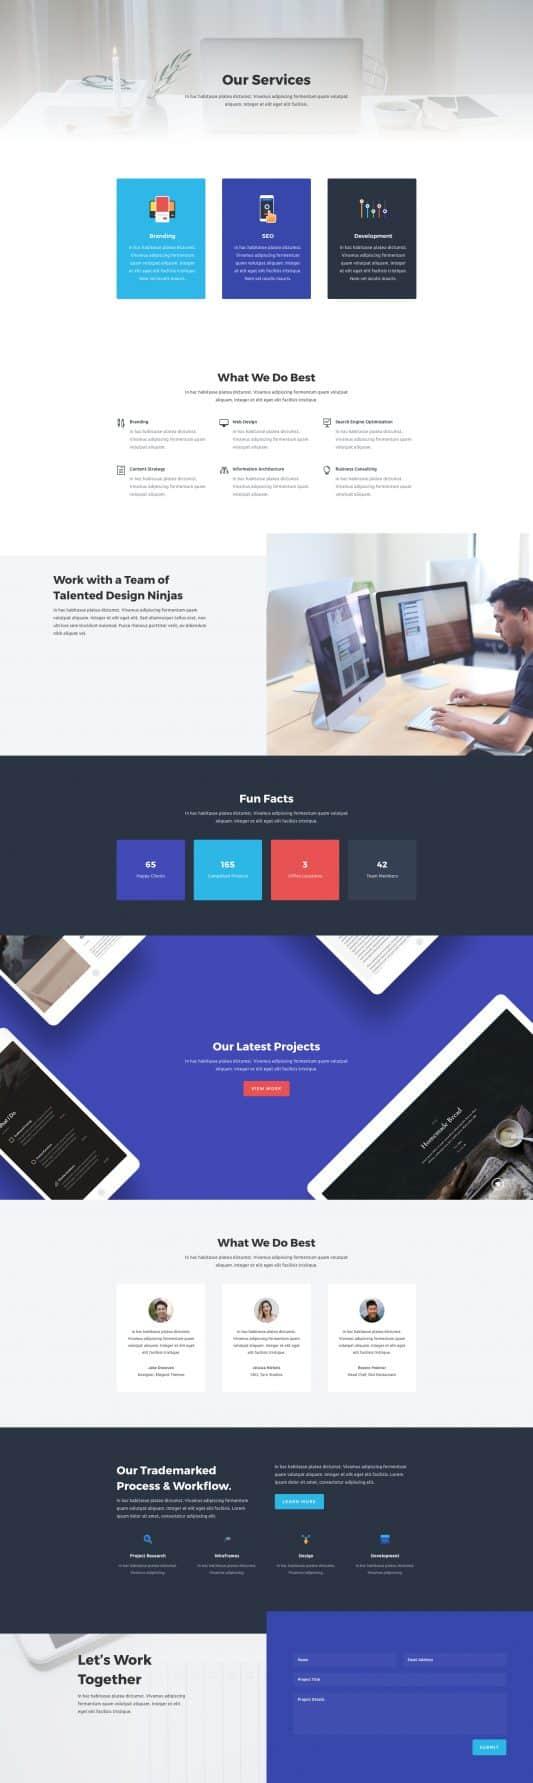 Web Agency Web Design 7